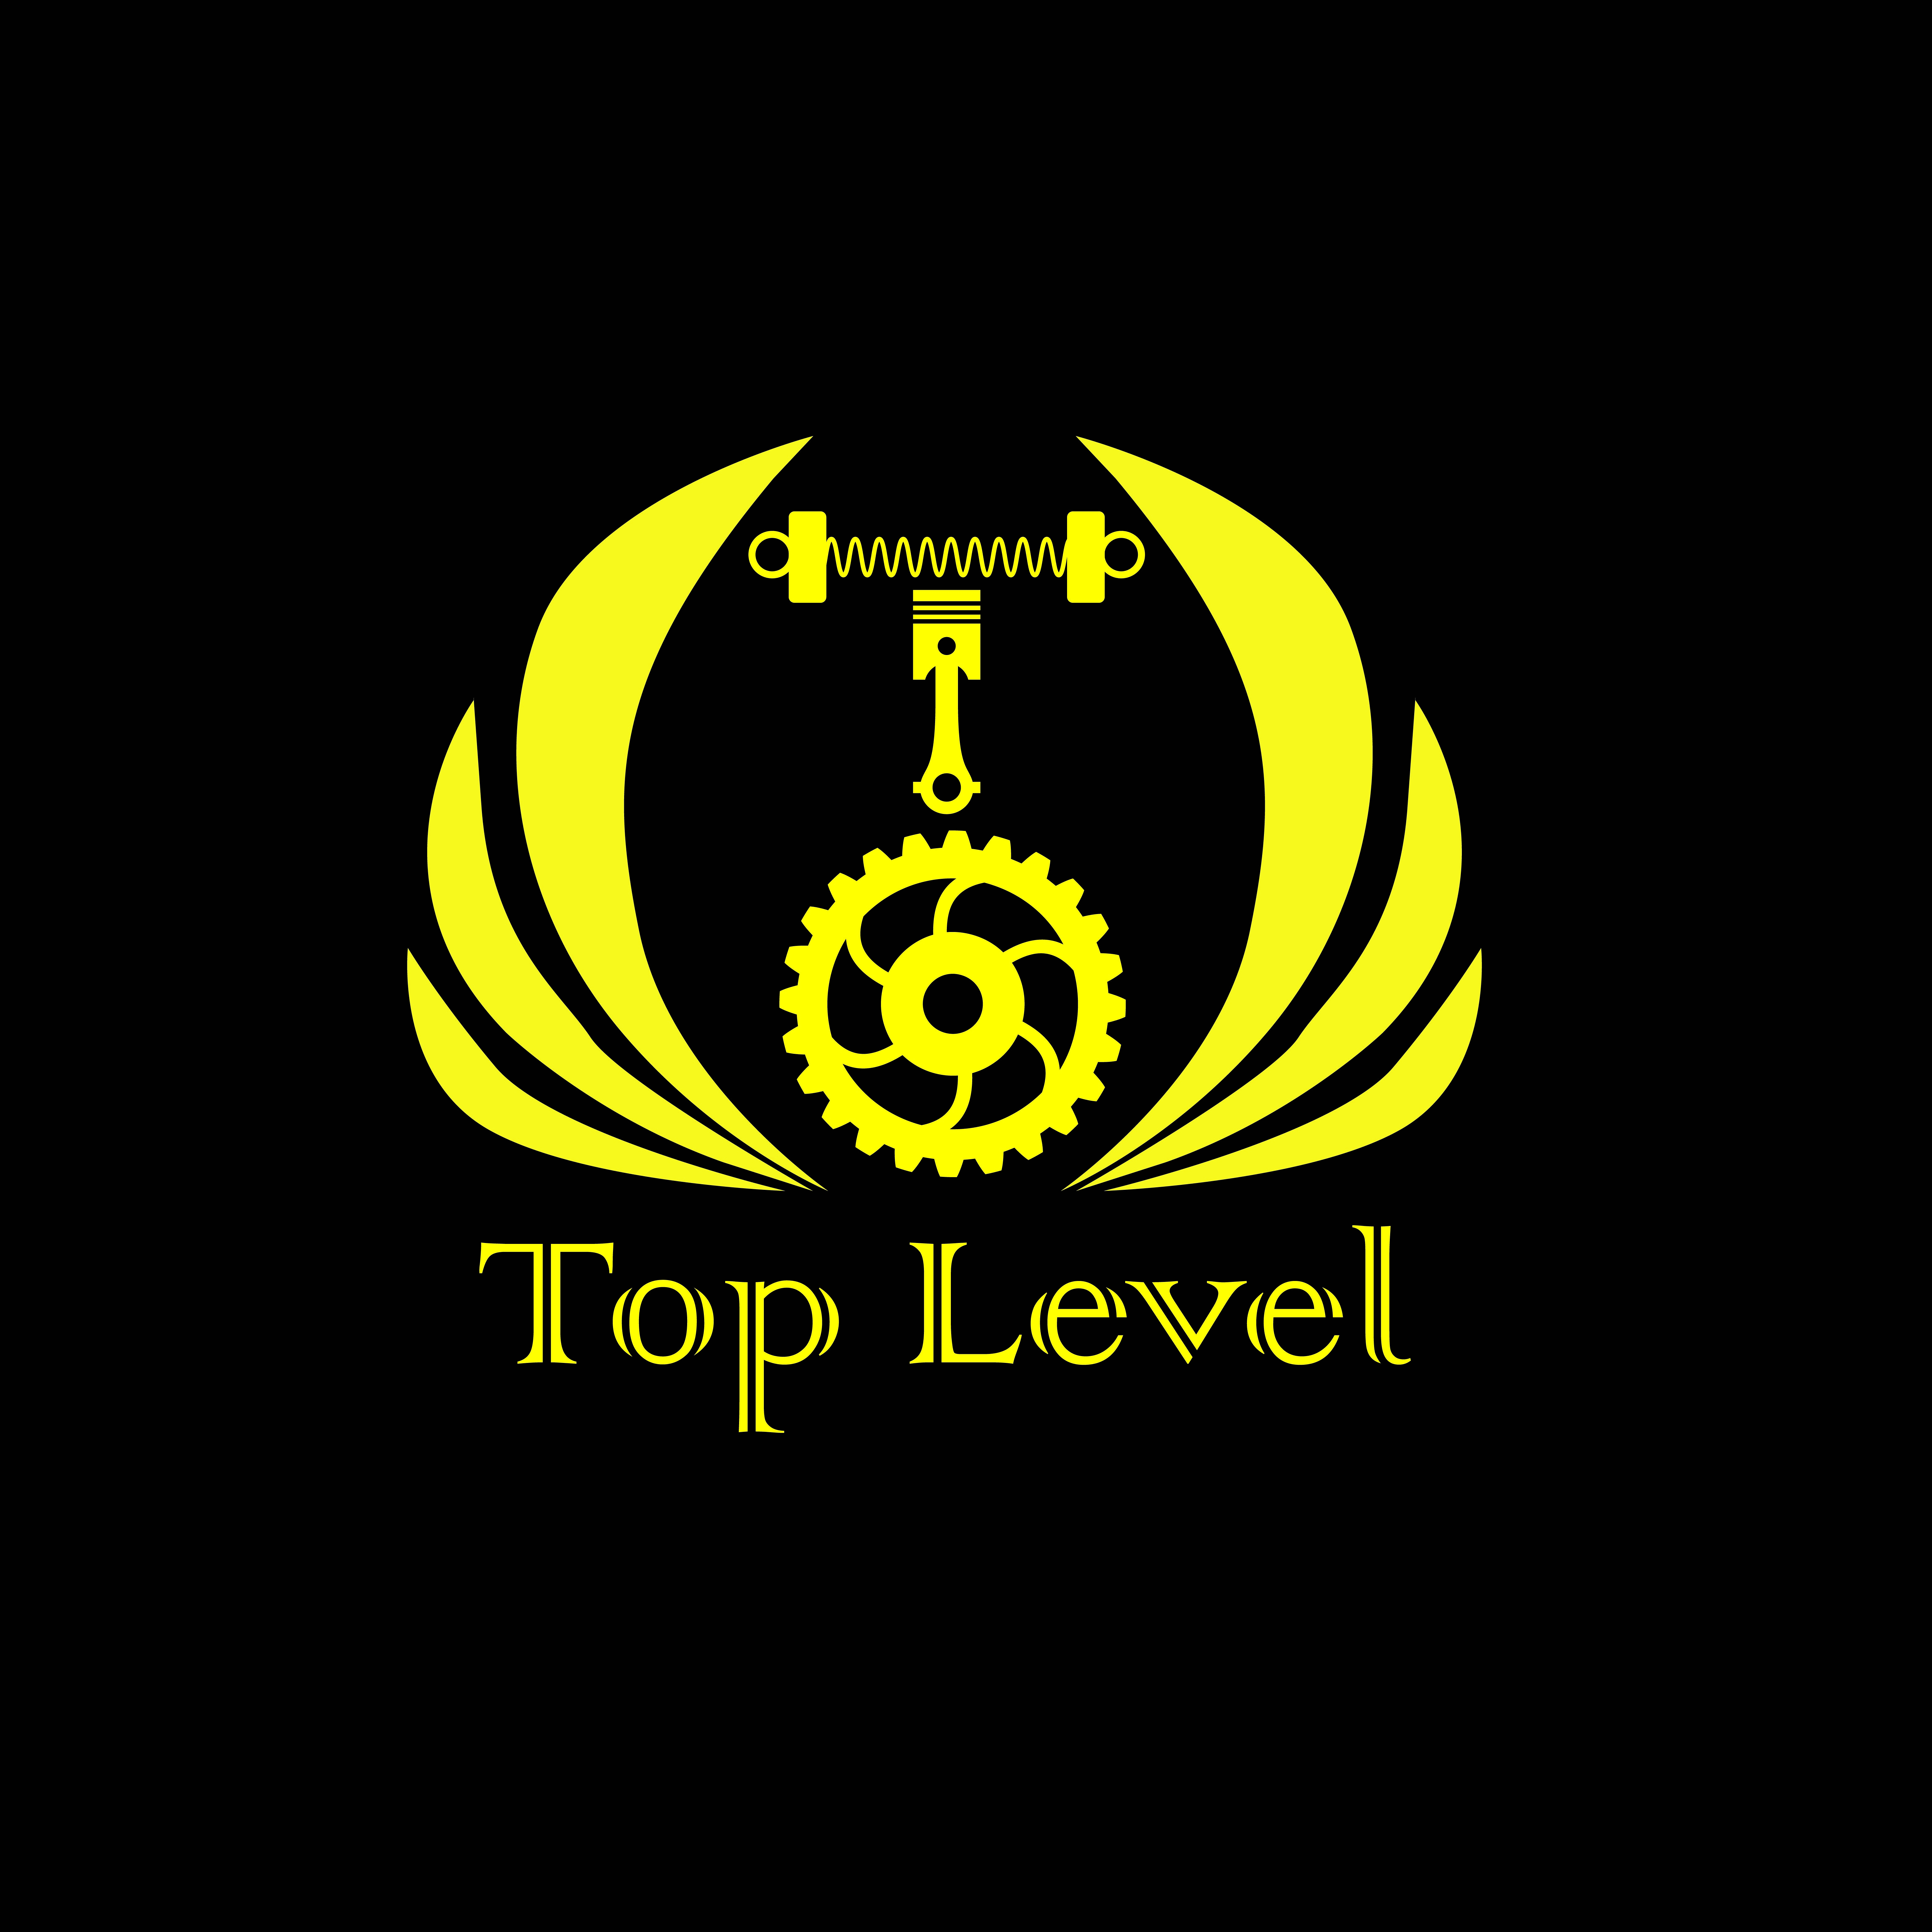 Разработка логотипа для тюнинг ателье фото f_4465f45ba2d652b5.jpg